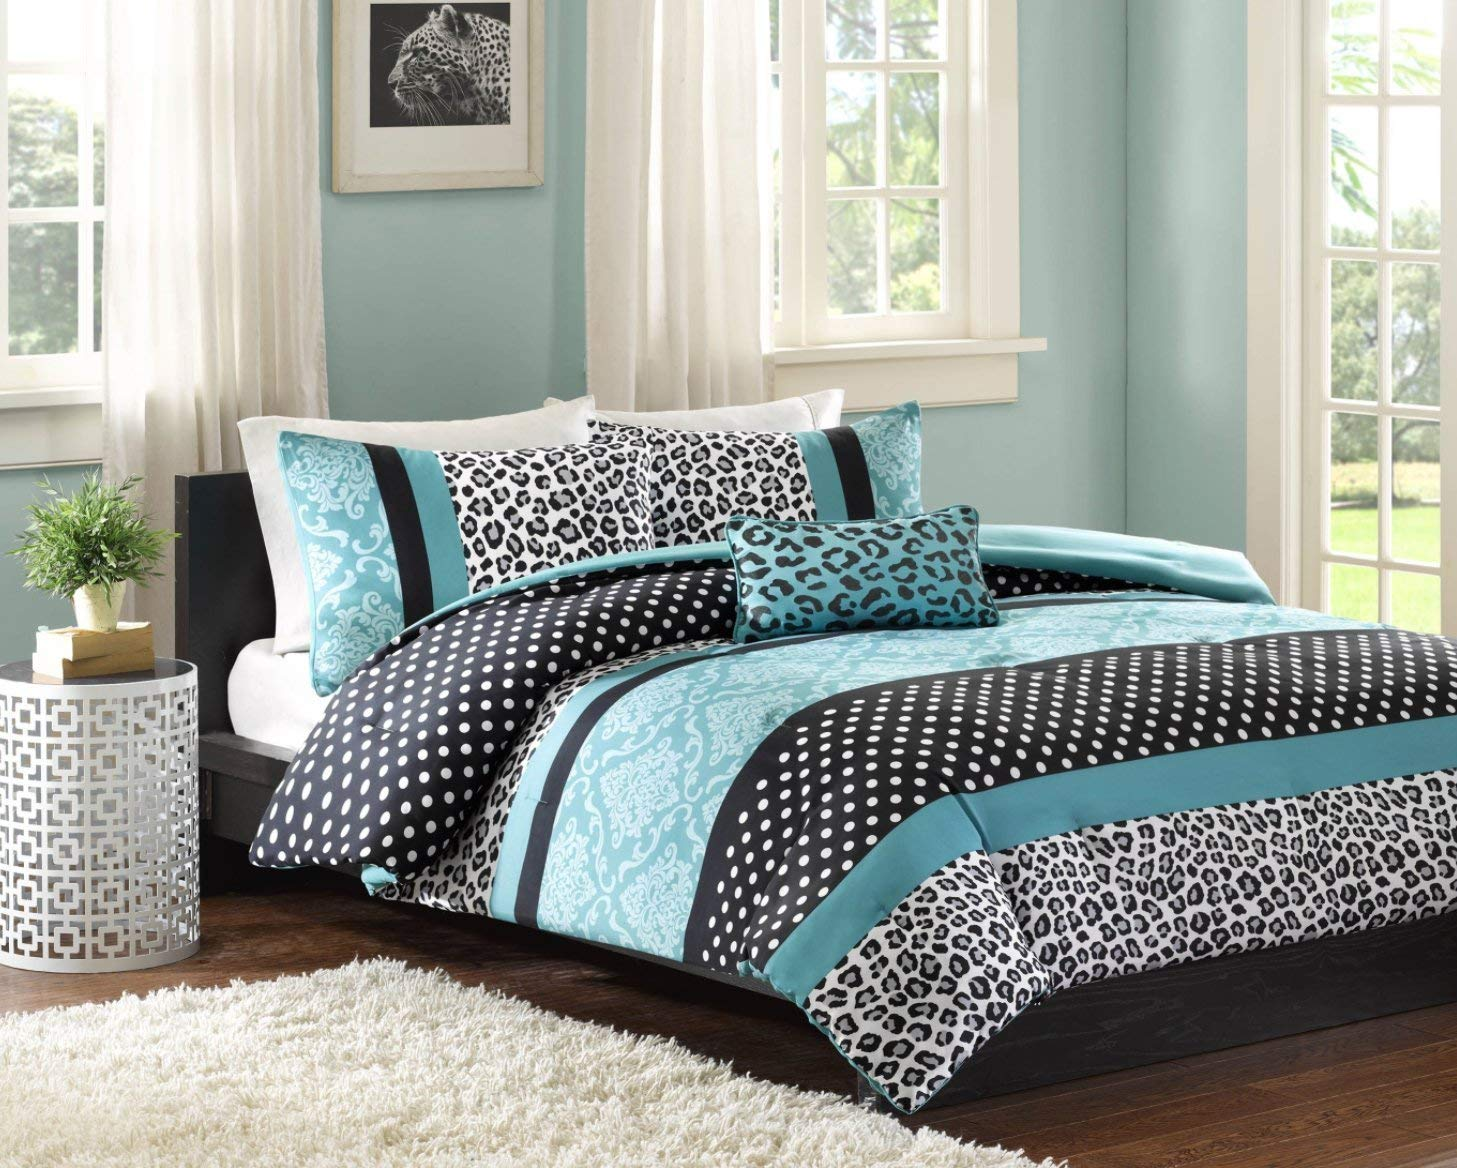 Comforter Bed Set Teen Bedding Modern Teal Black Animal Girls Bedspead Update Home (Twin XL)